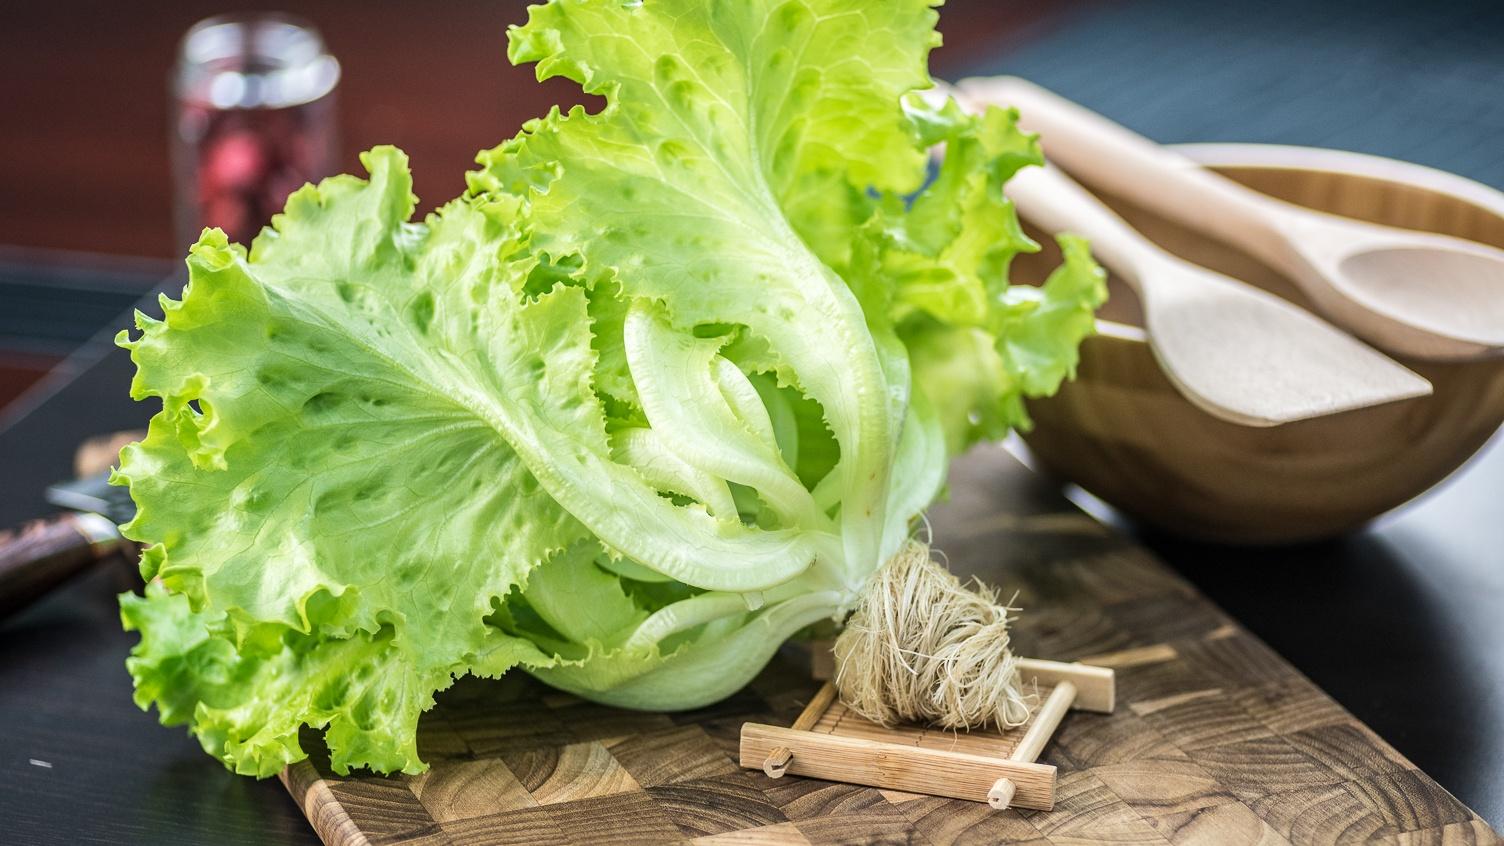 AEssenseGrows - Green Floral Leaf Lettuce